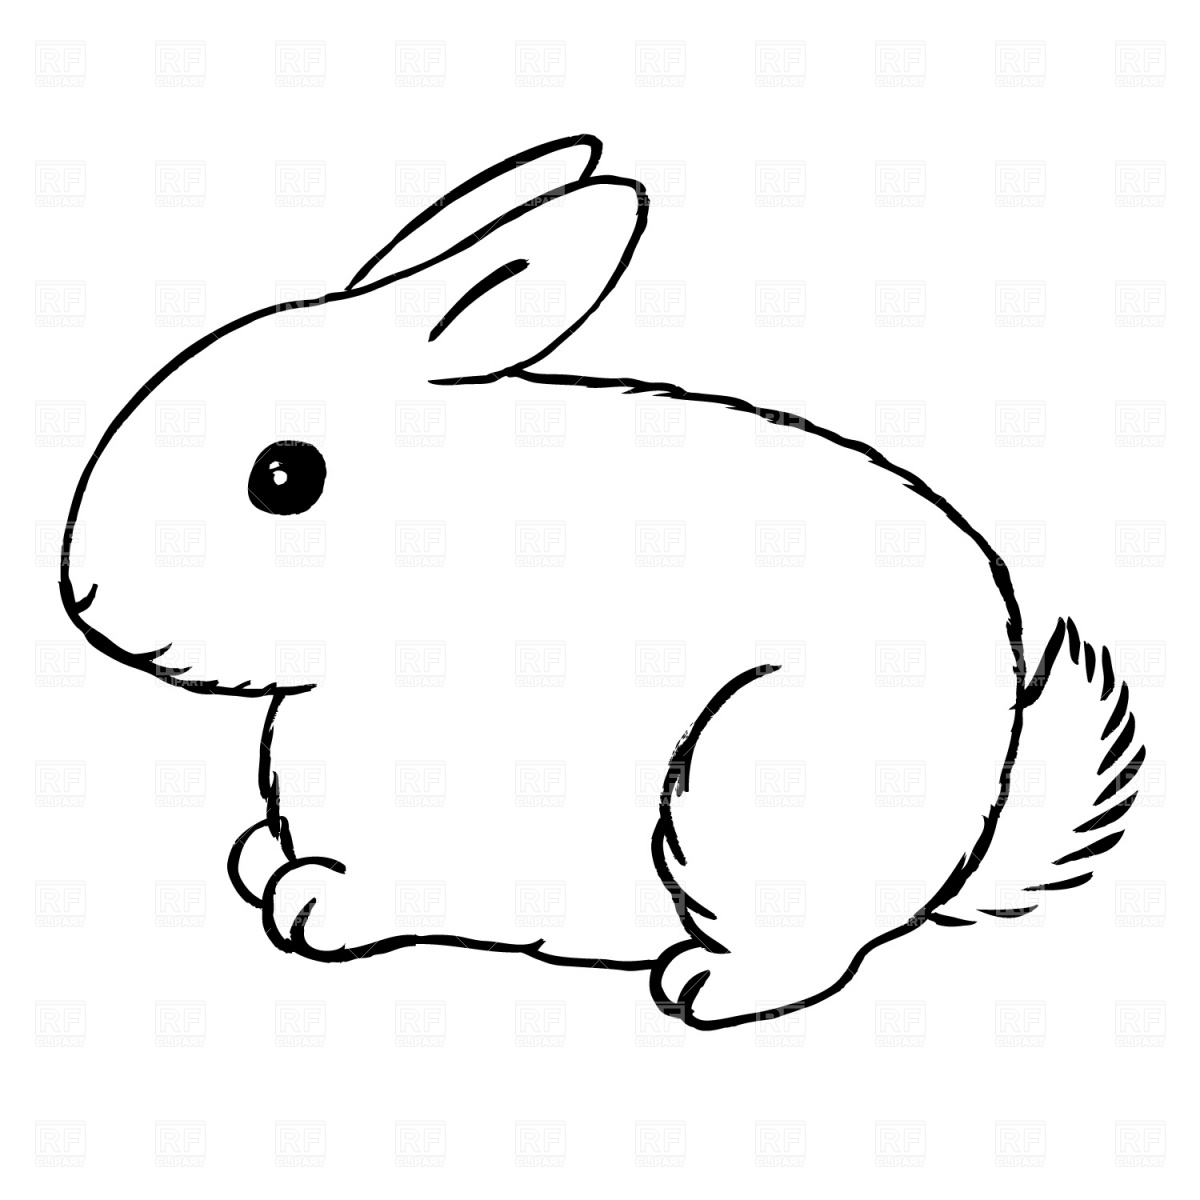 1200x1200 Clip Art Rabbit